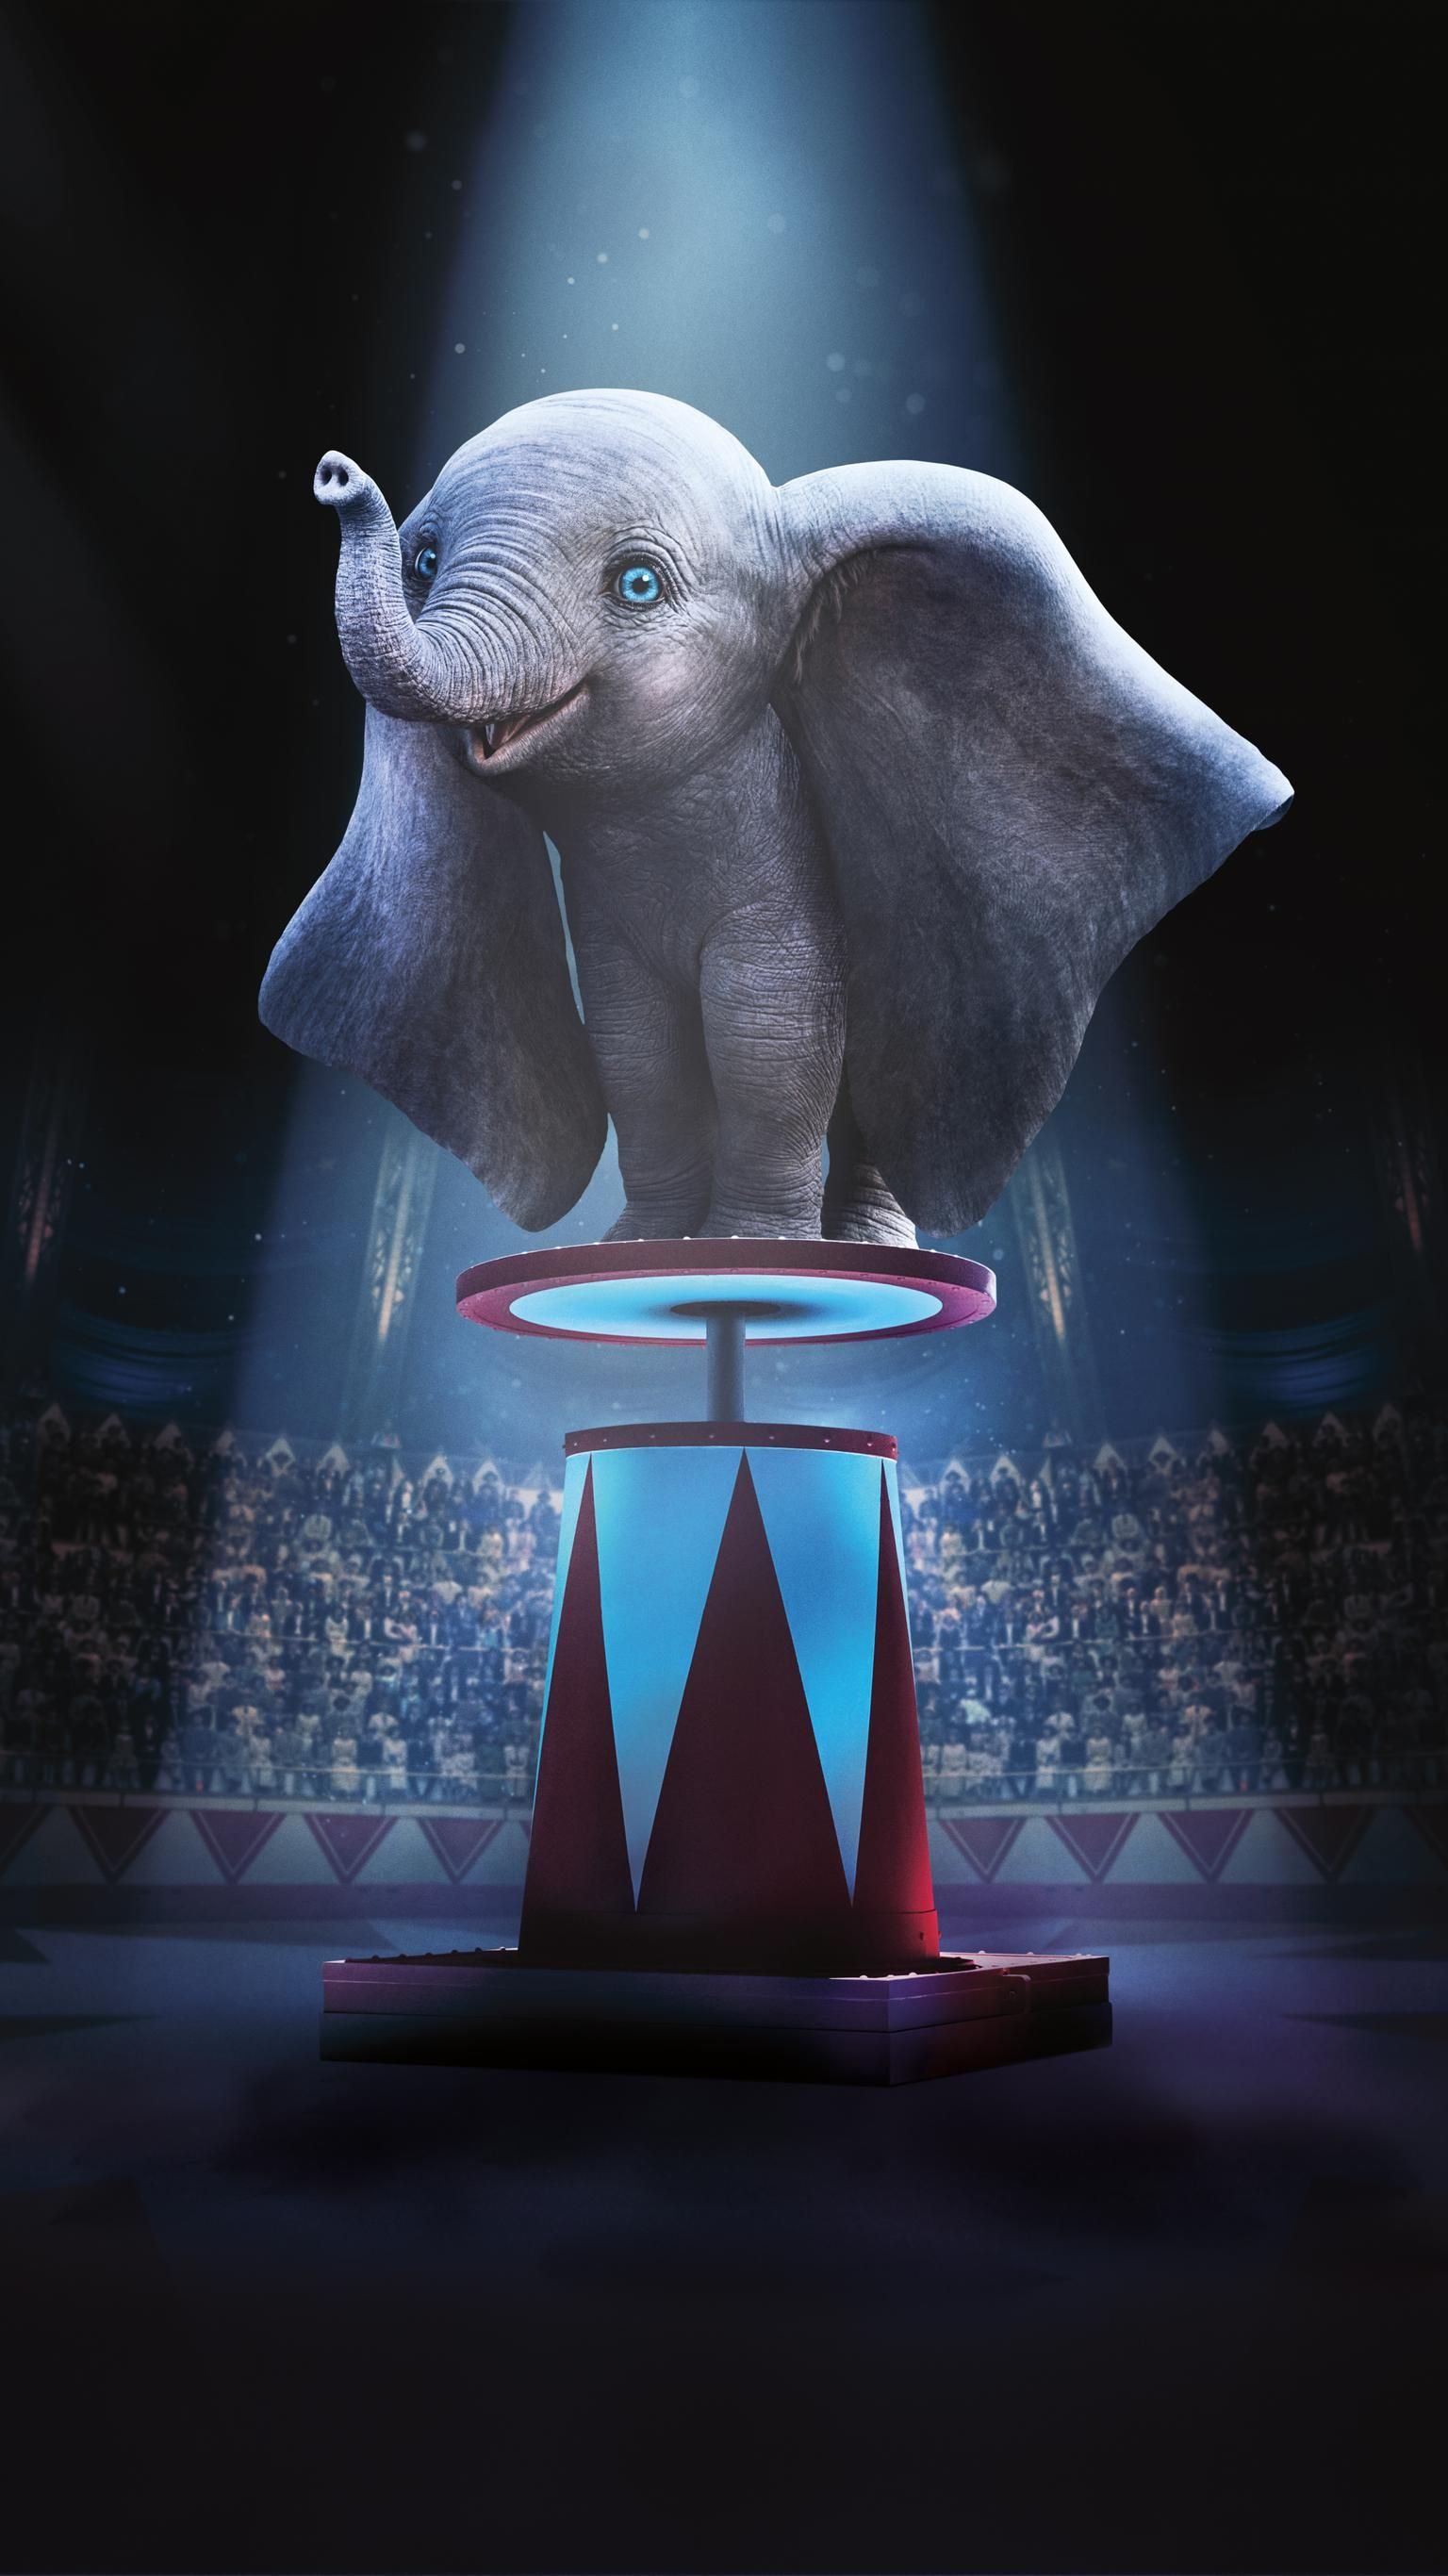 Dumbo 2019 Phone Wallpaper Dumbo Movie Wallpaper Movie